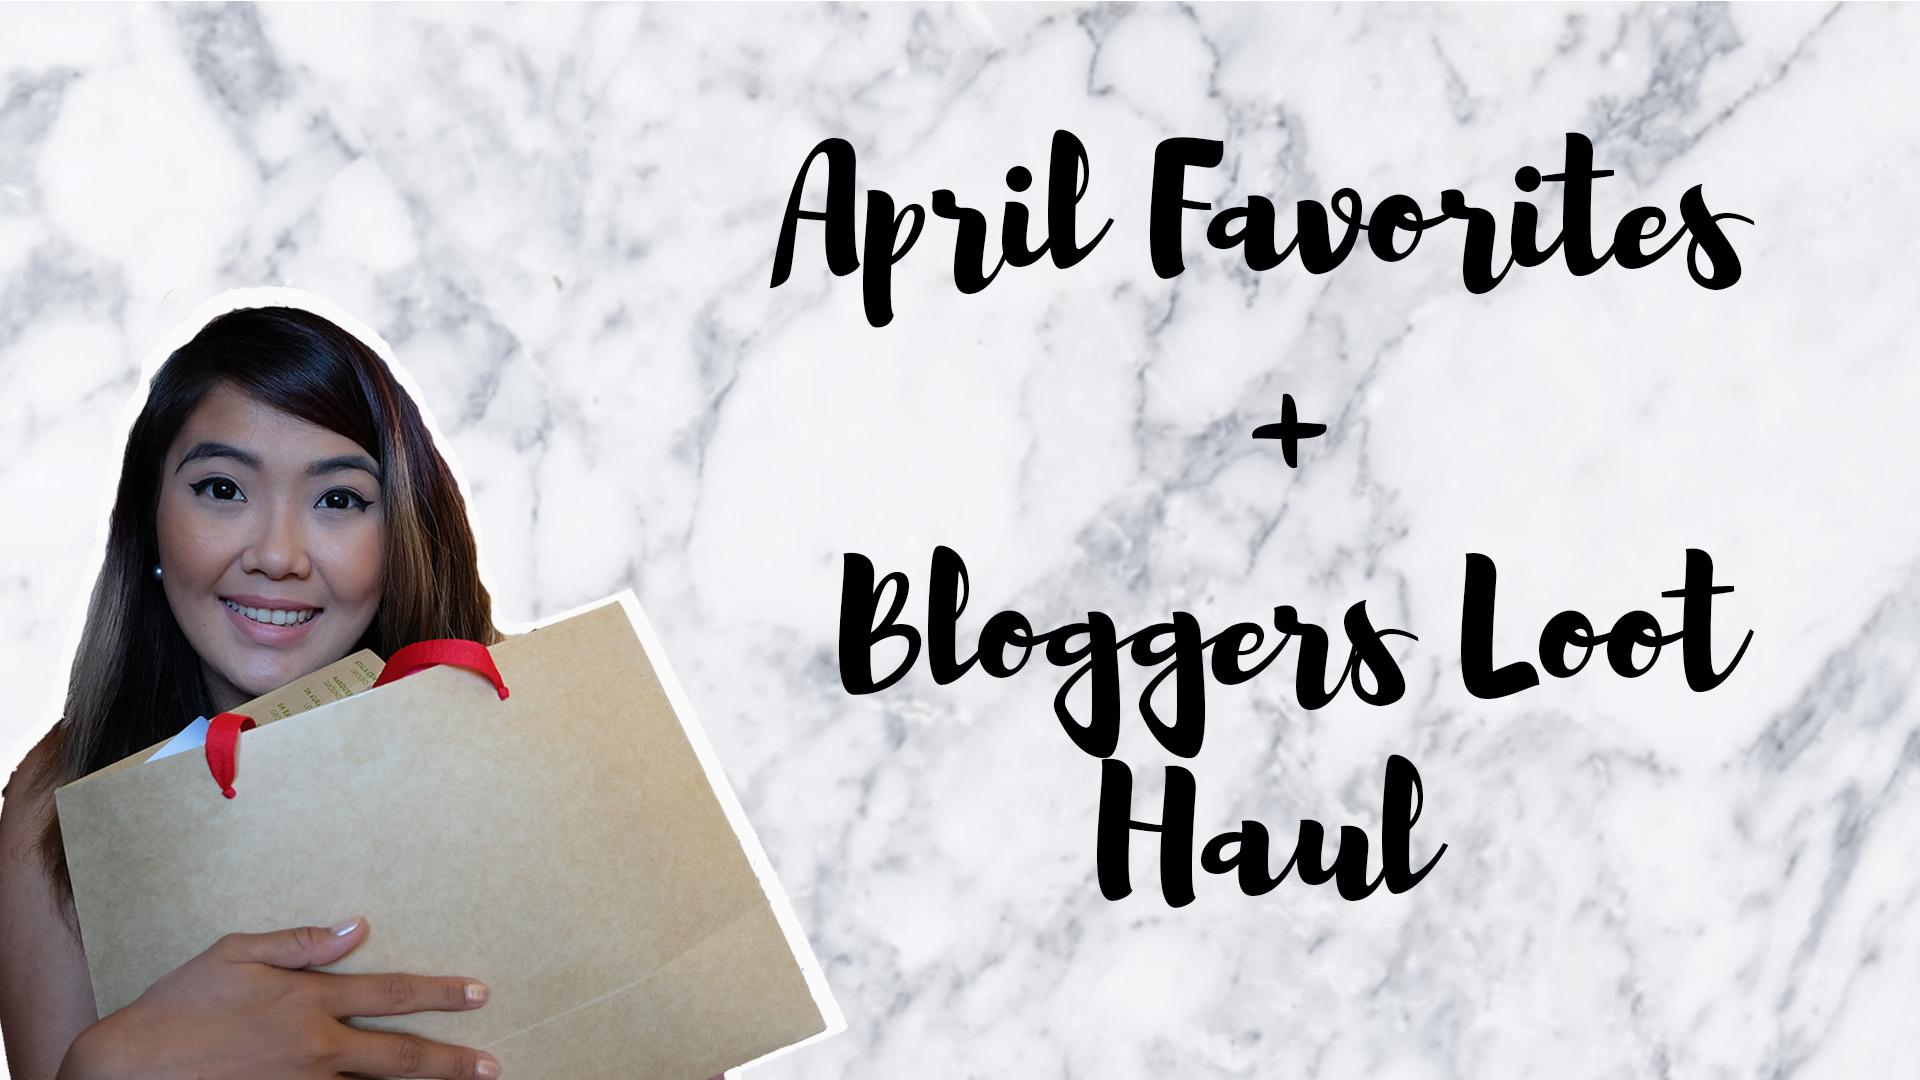 [VLOG] April Favorites + Blogger Loot Haul (What Freebies Do Bloggers/ Vloggers Get?)